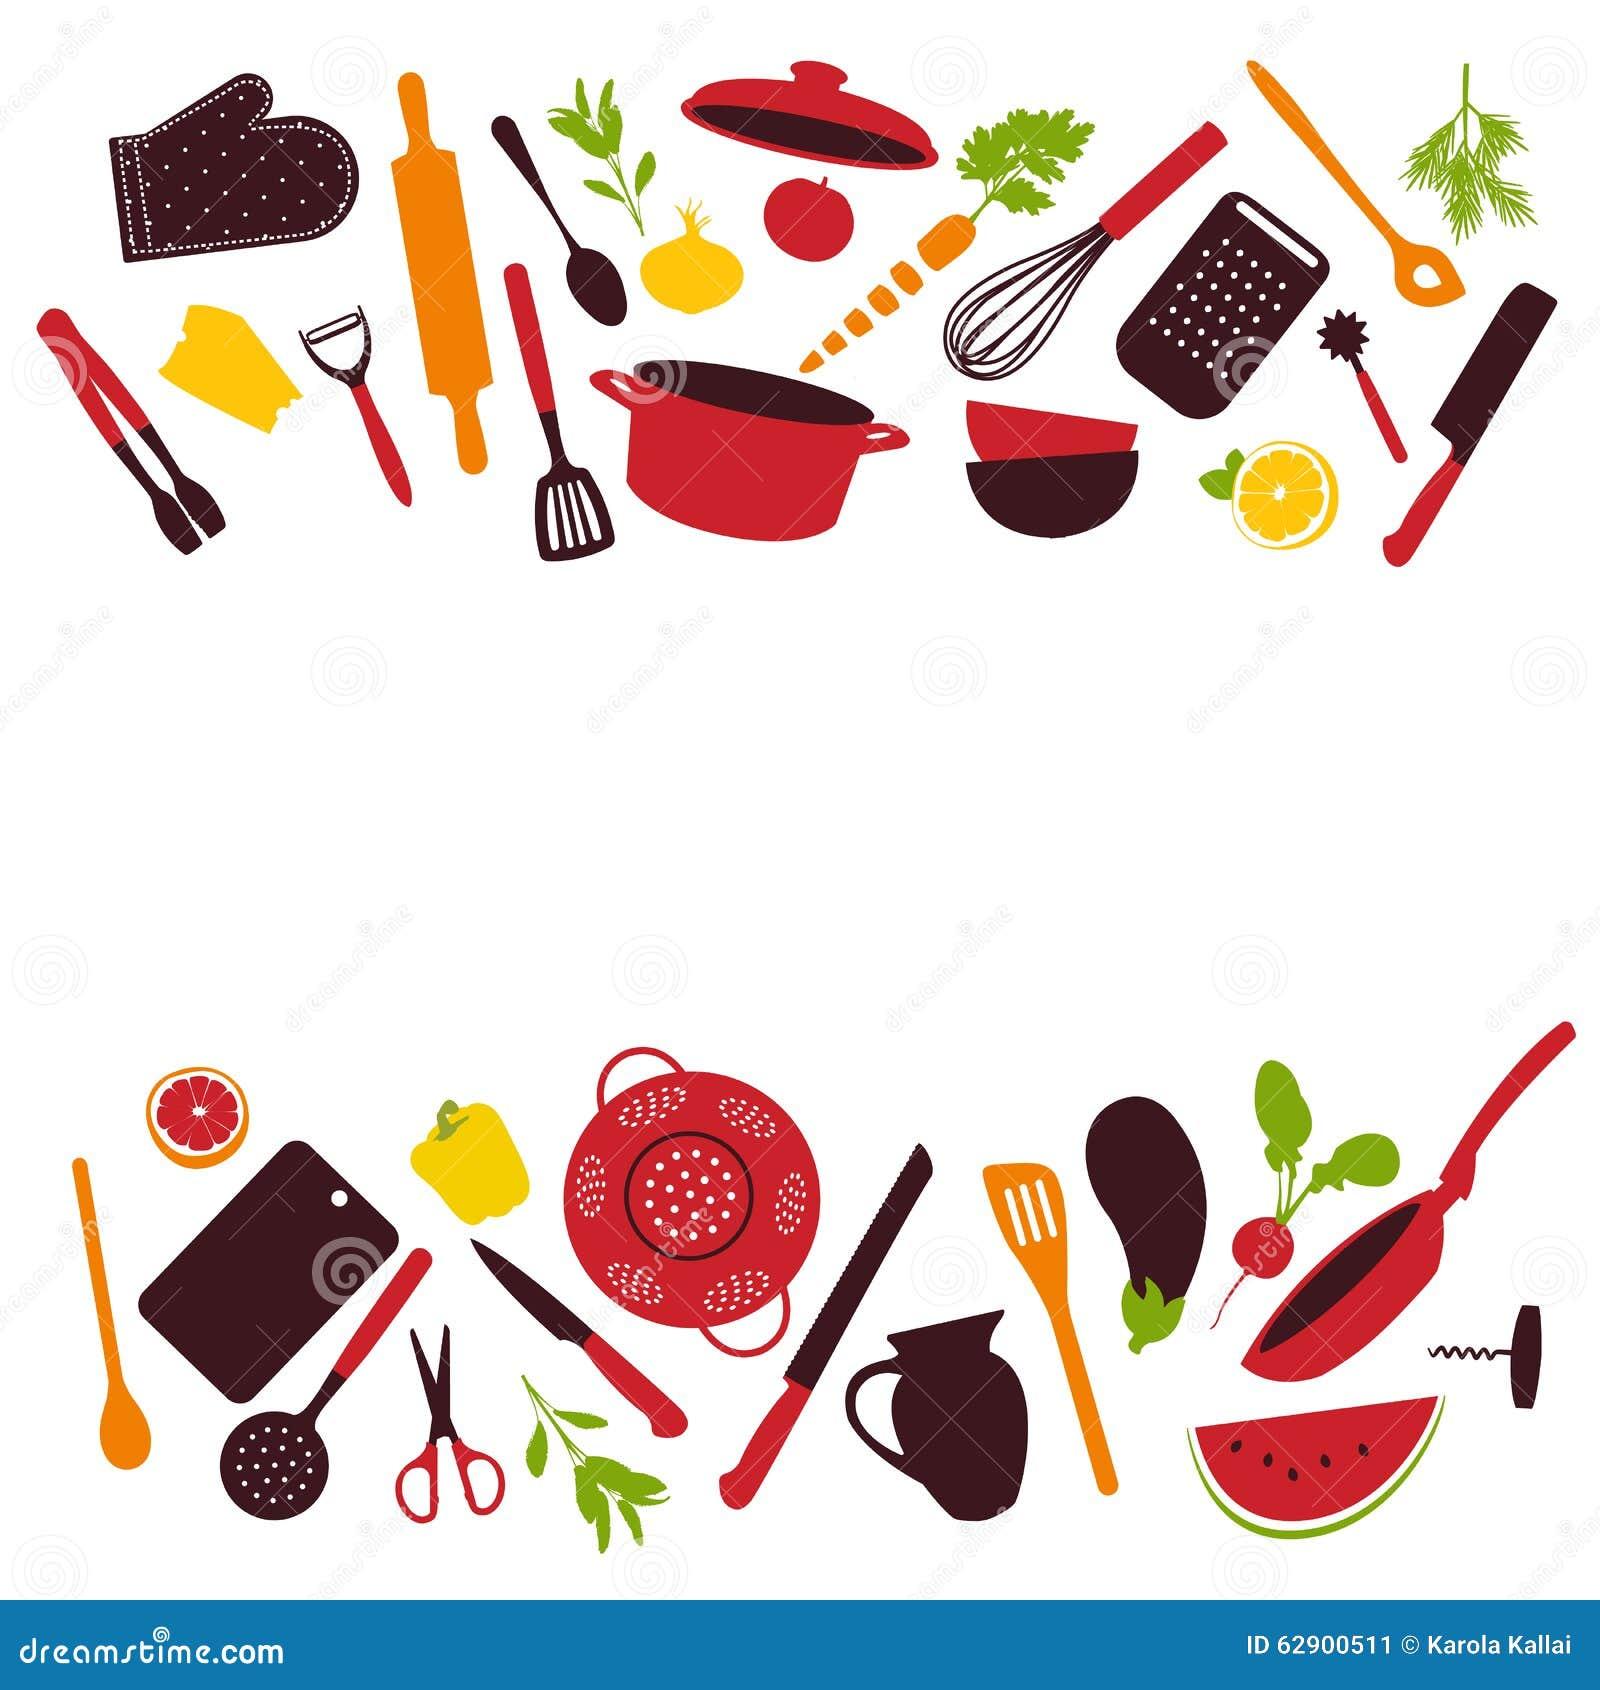 Kitchen Utensils Background: Kitchen Tools Background Stock Vector. Image Of Herbs